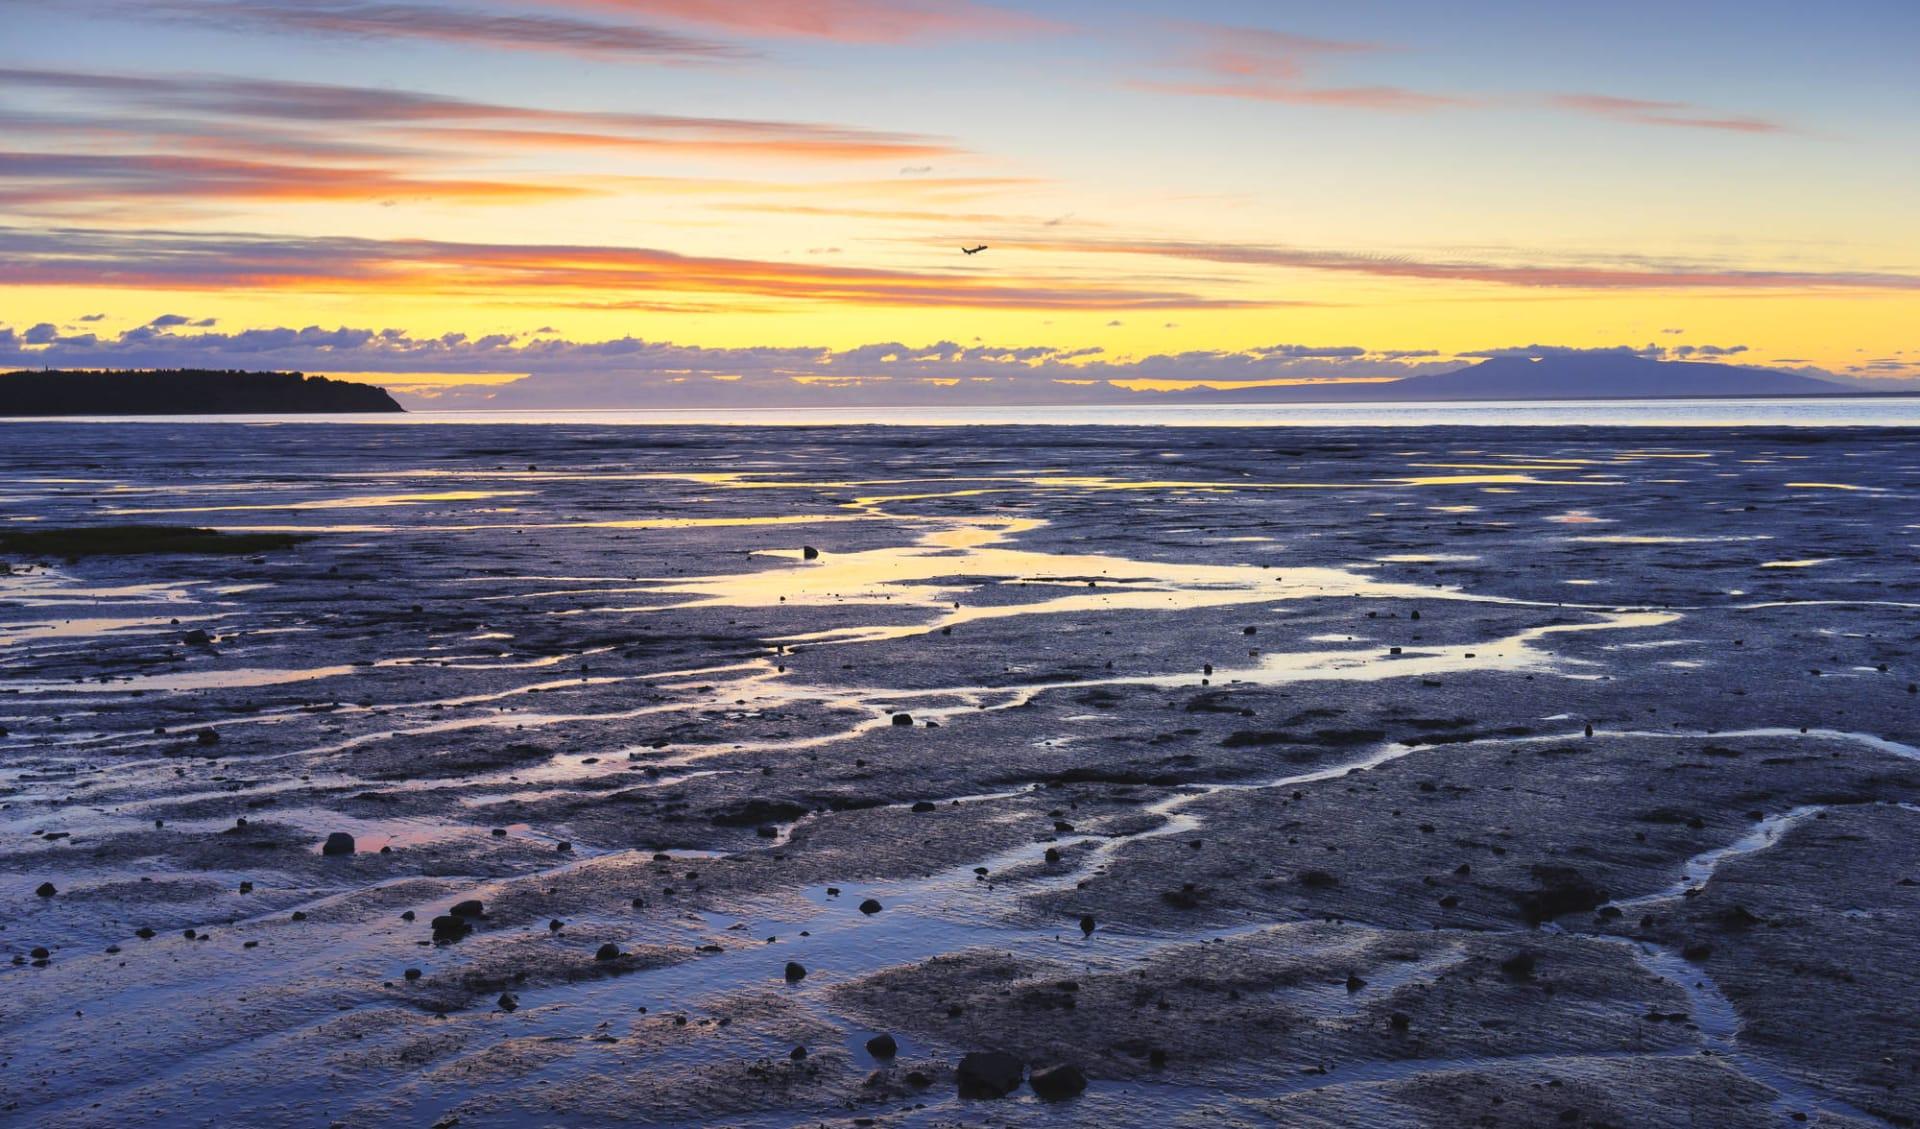 Zauberhaftes Alaska & Yukon ab Anchorage: Alaska - Anchorage - Seashore